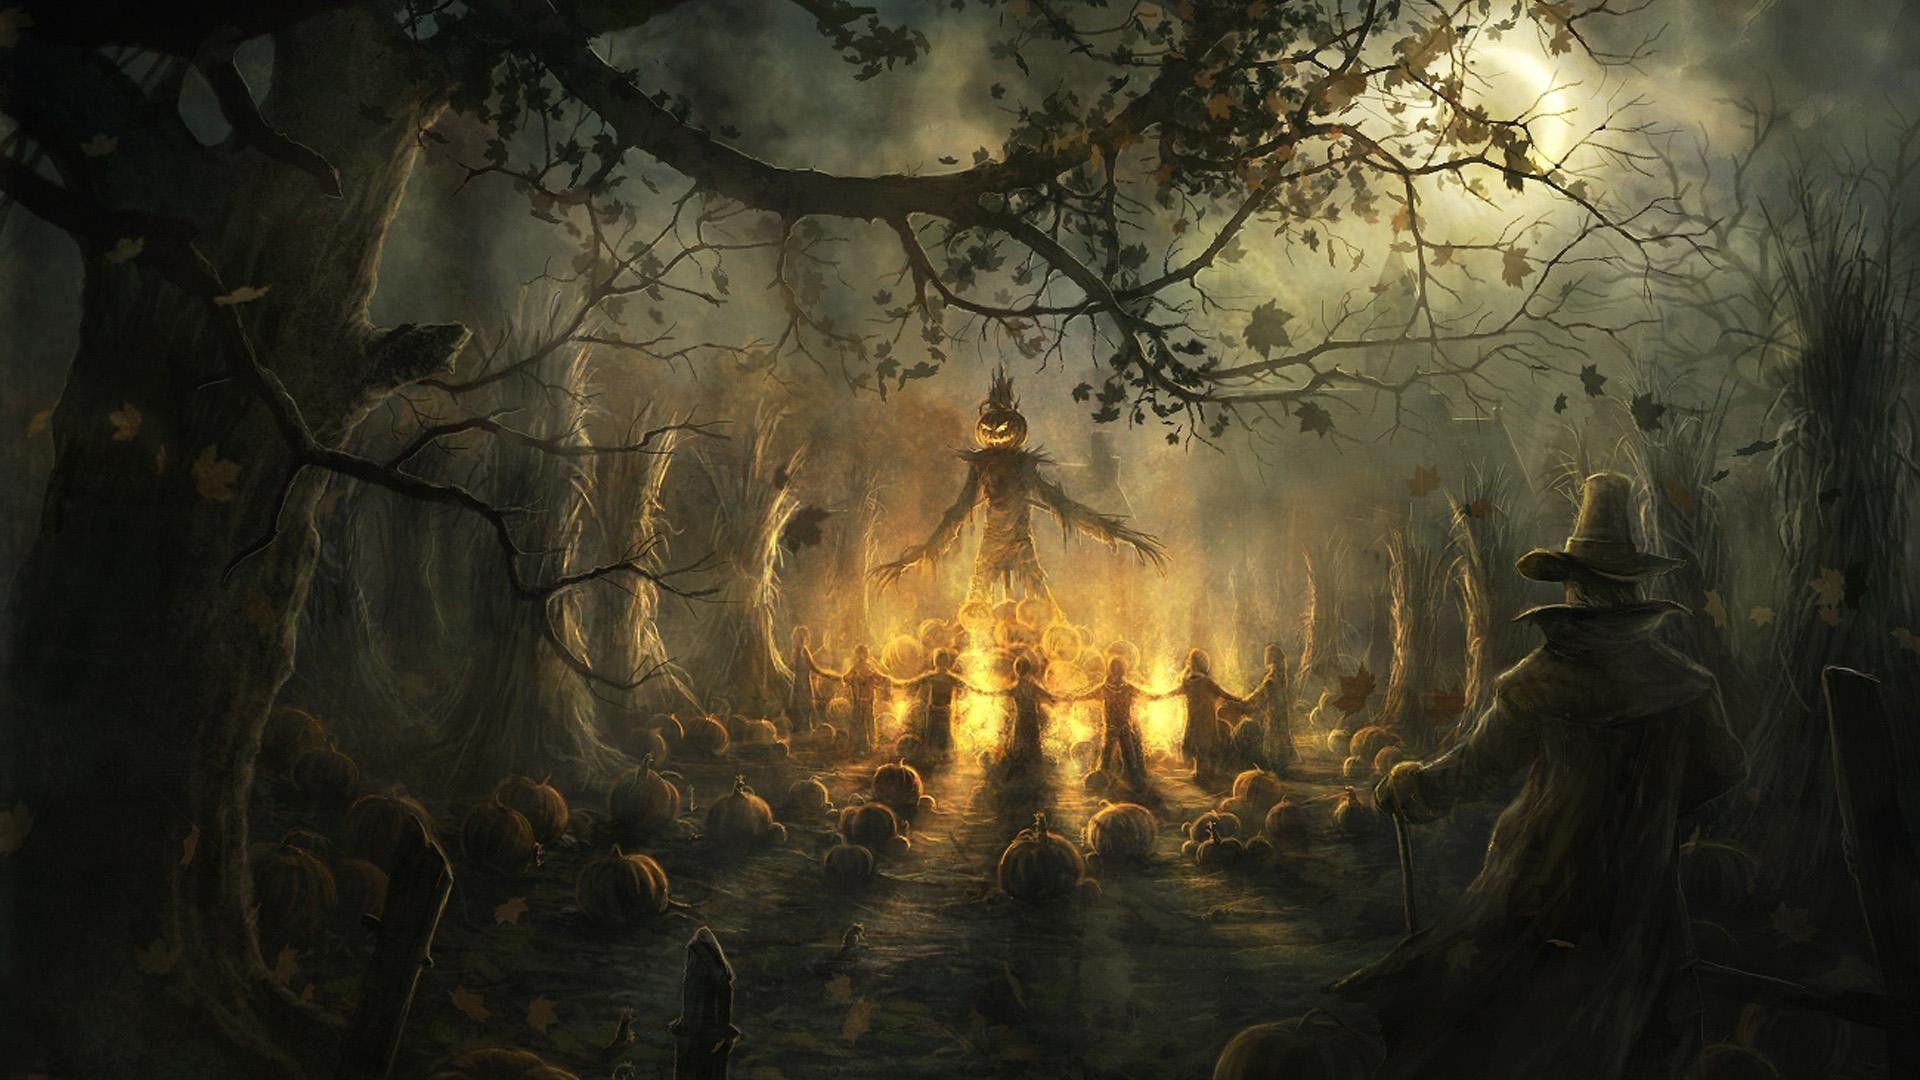 Scary Halloween Desktop Backgrounds 1920x1080